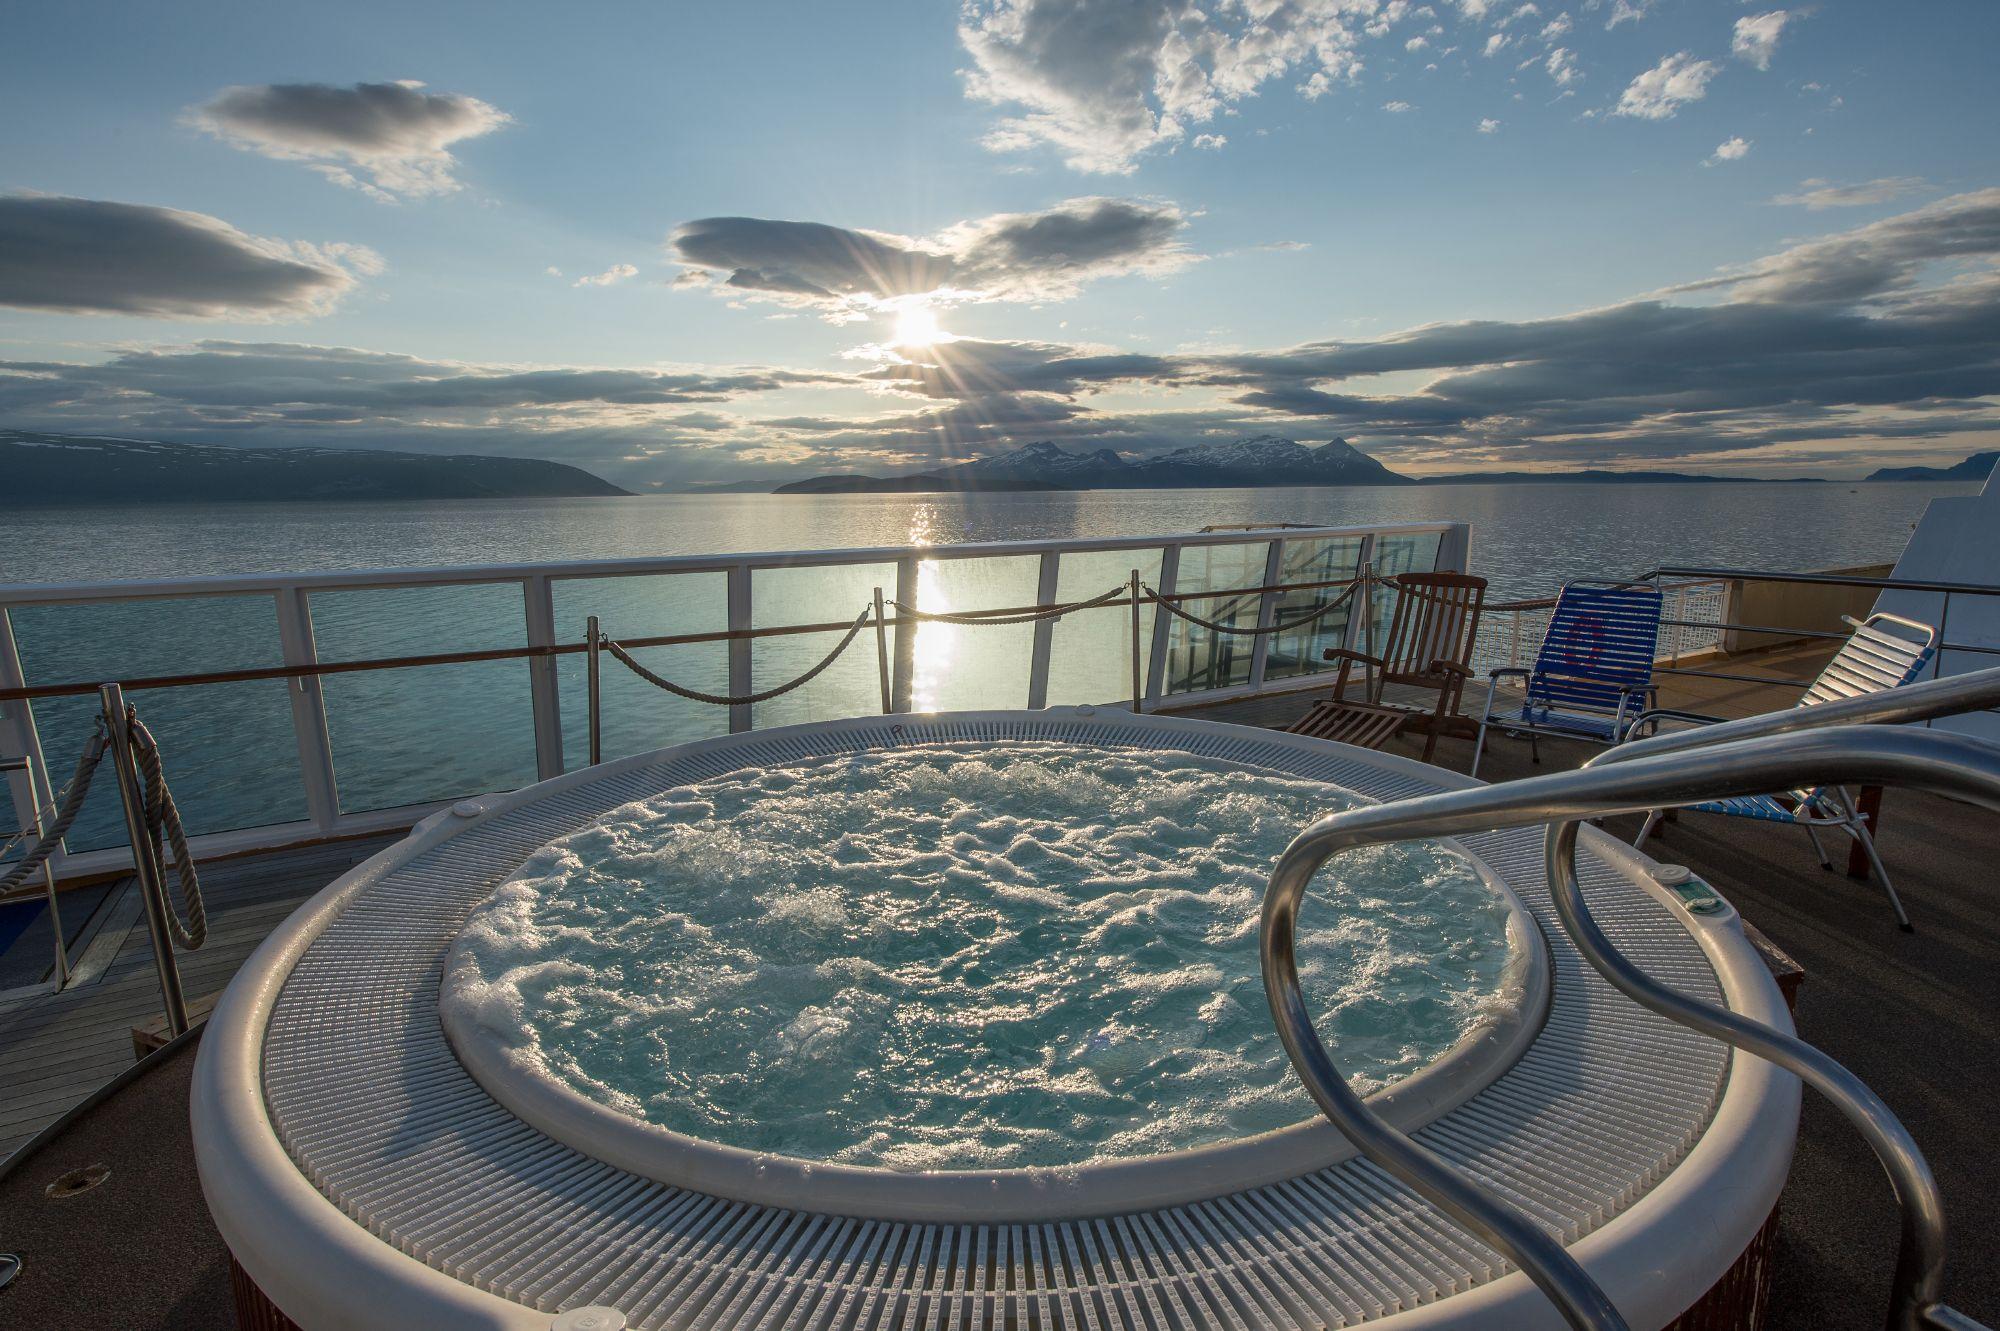 Hurtigruten Cruise Lines MS Midnatsol Exterior Jacuzzi.jpg